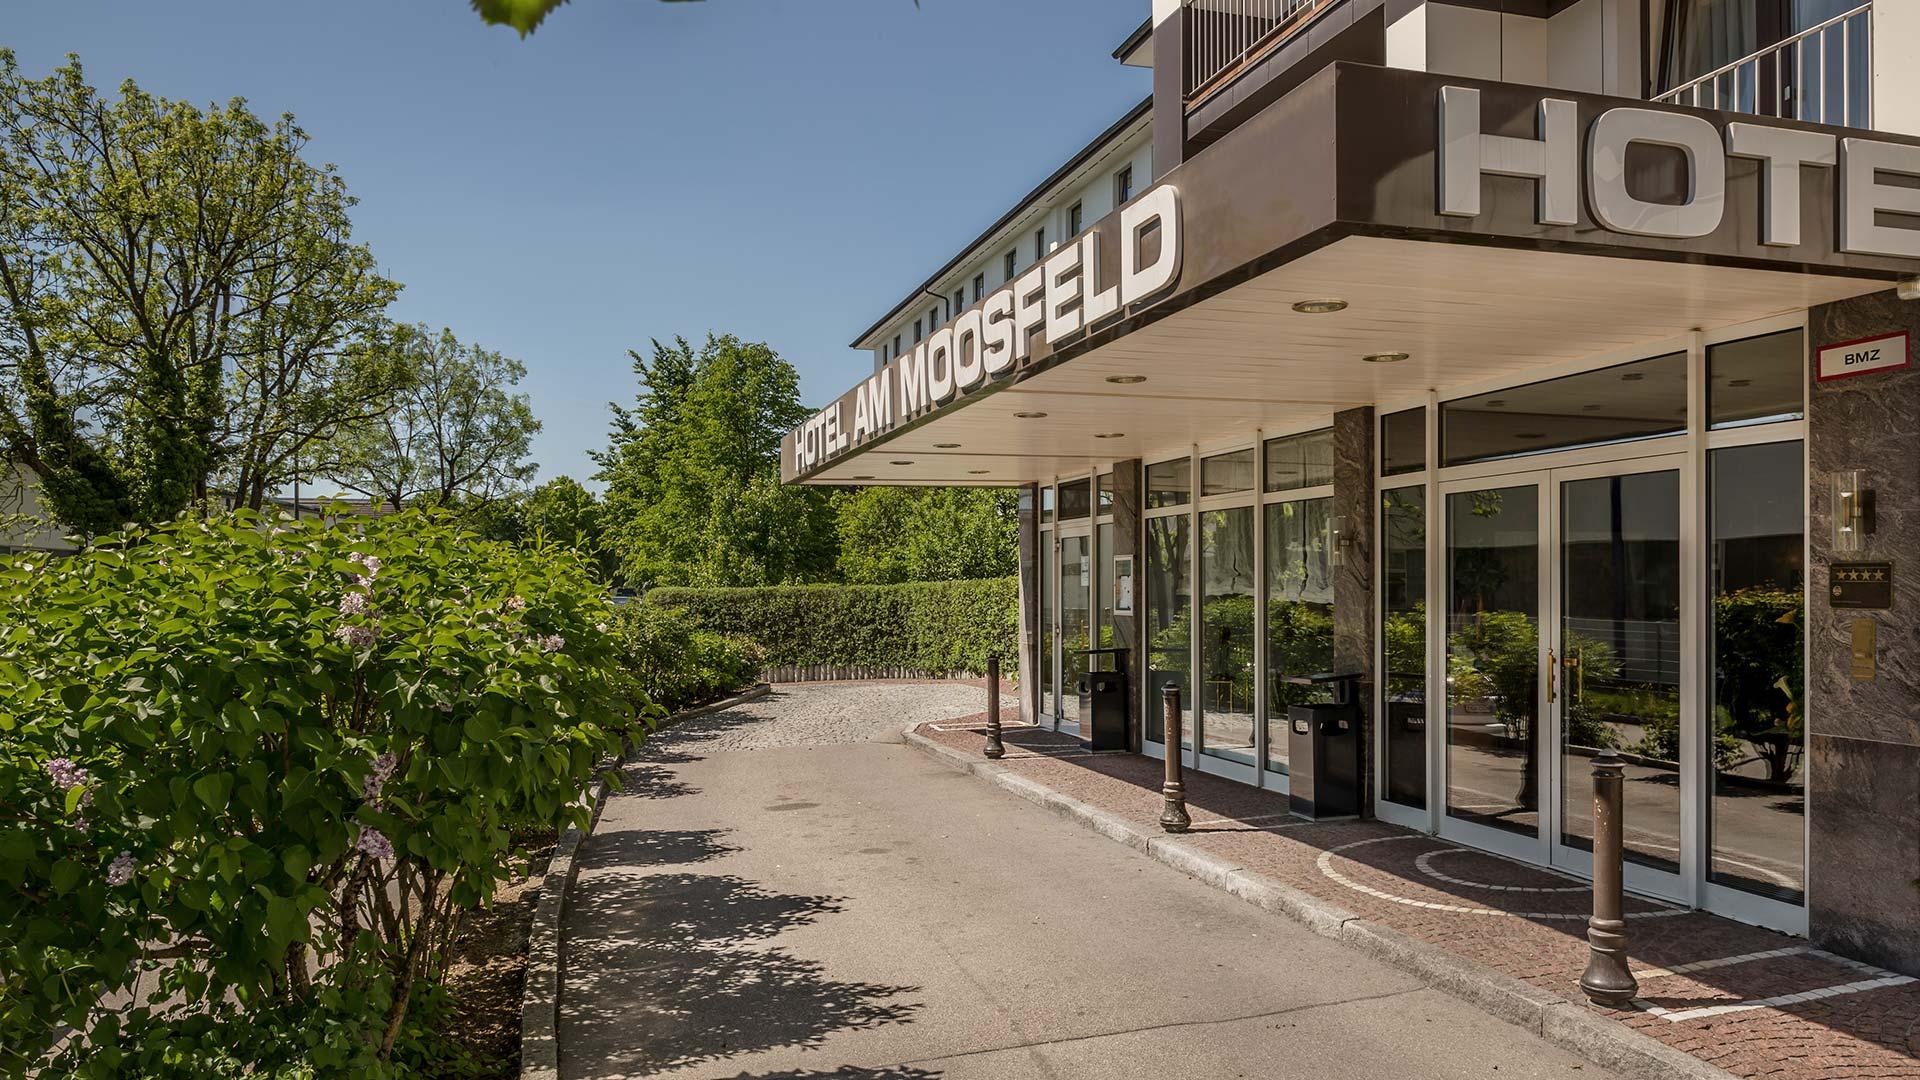 Munchen Hotel Am Moosfeld